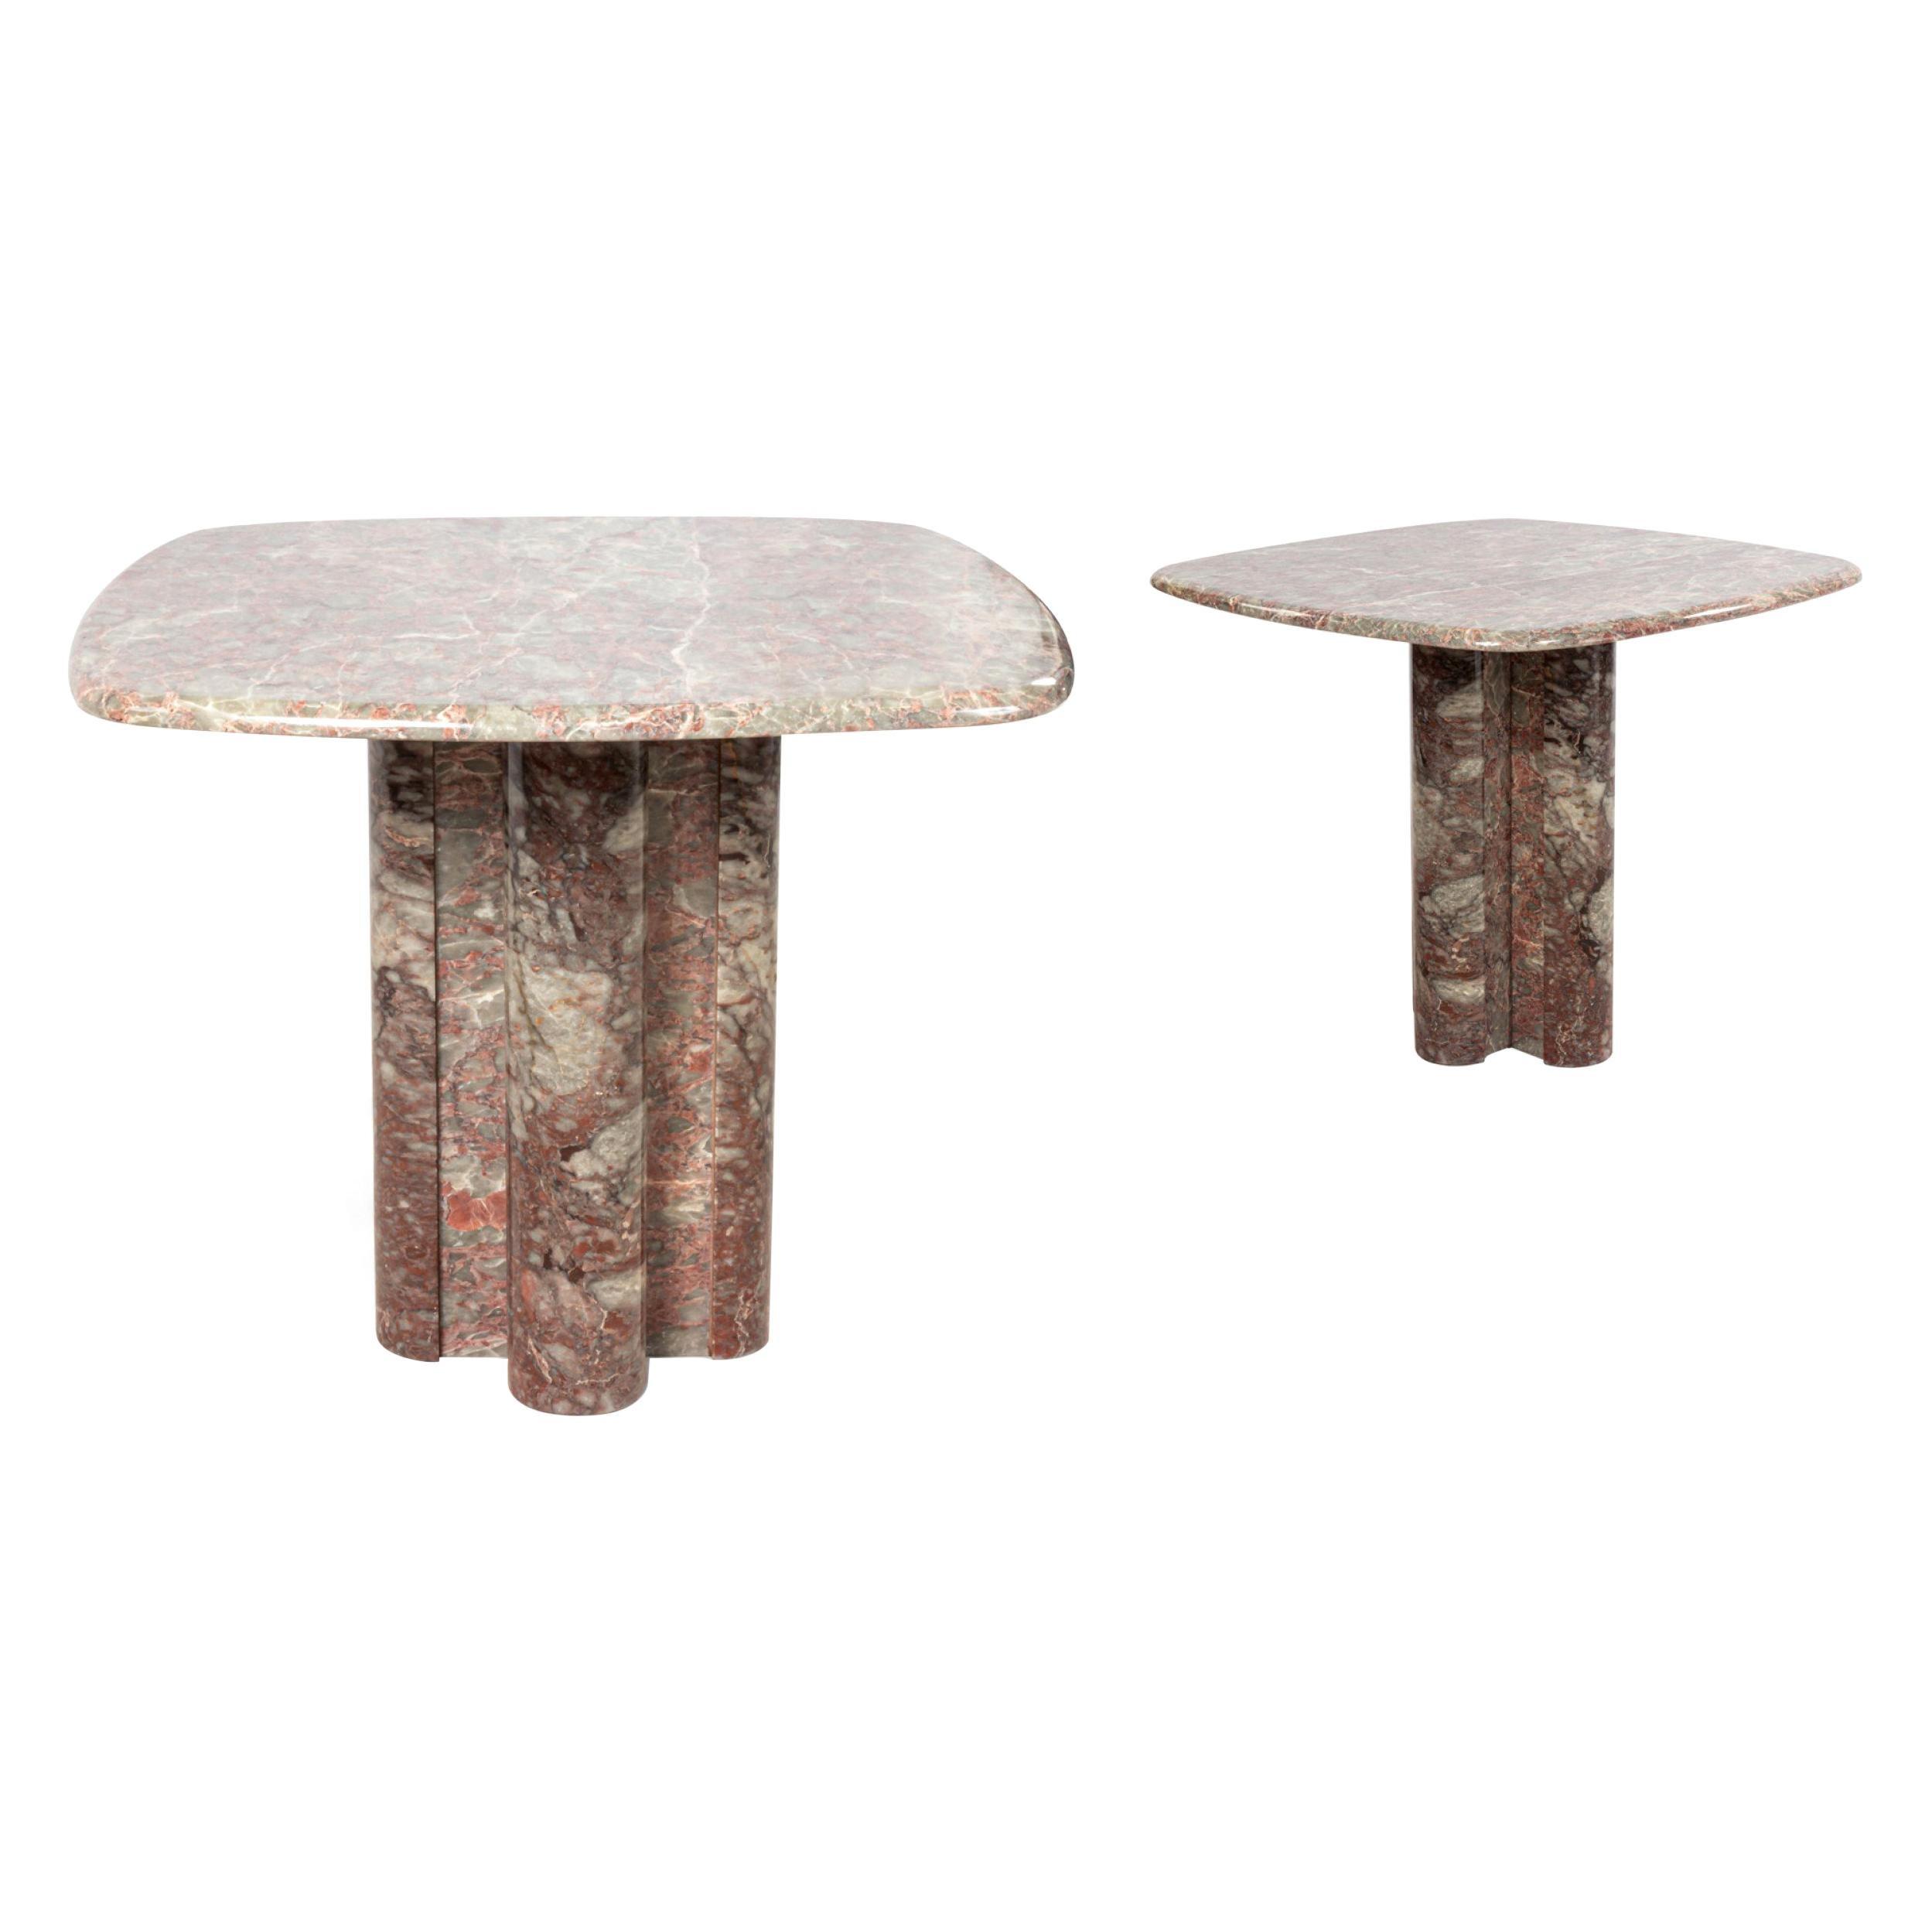 Midcentury Italian Marble End Tables